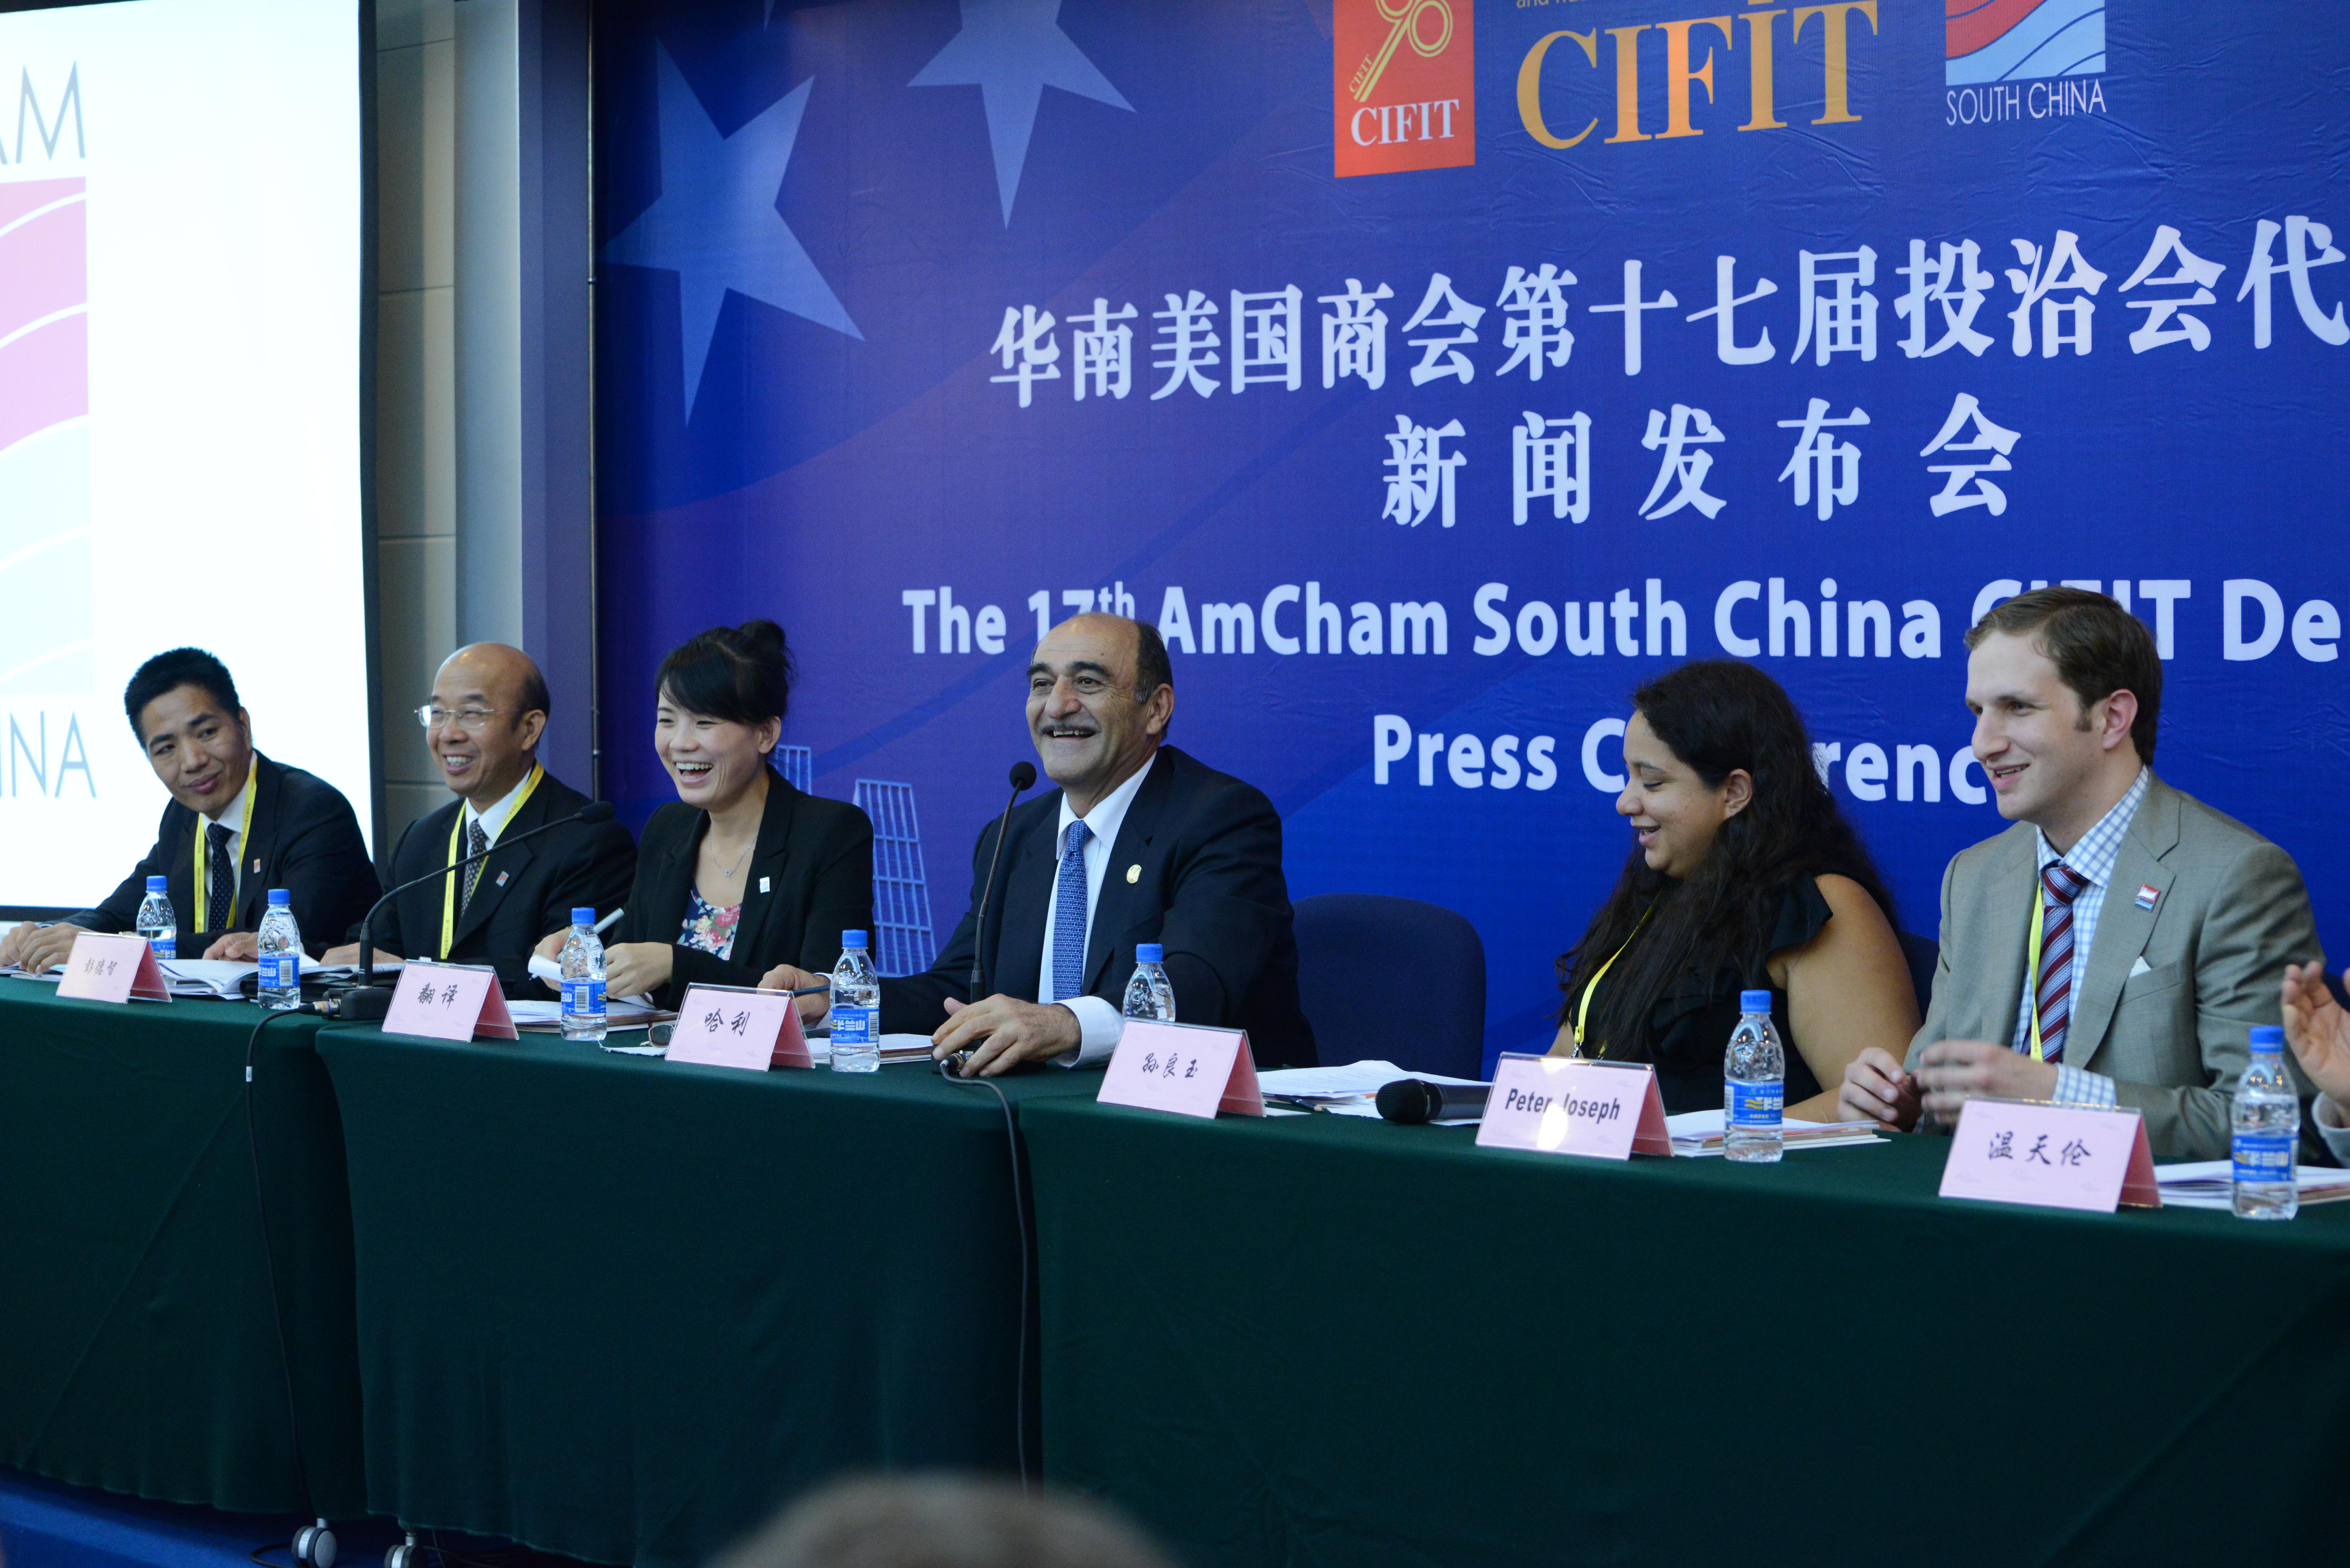 Trade Mission to China & Taiwan, Trip to Washington DC Recapped